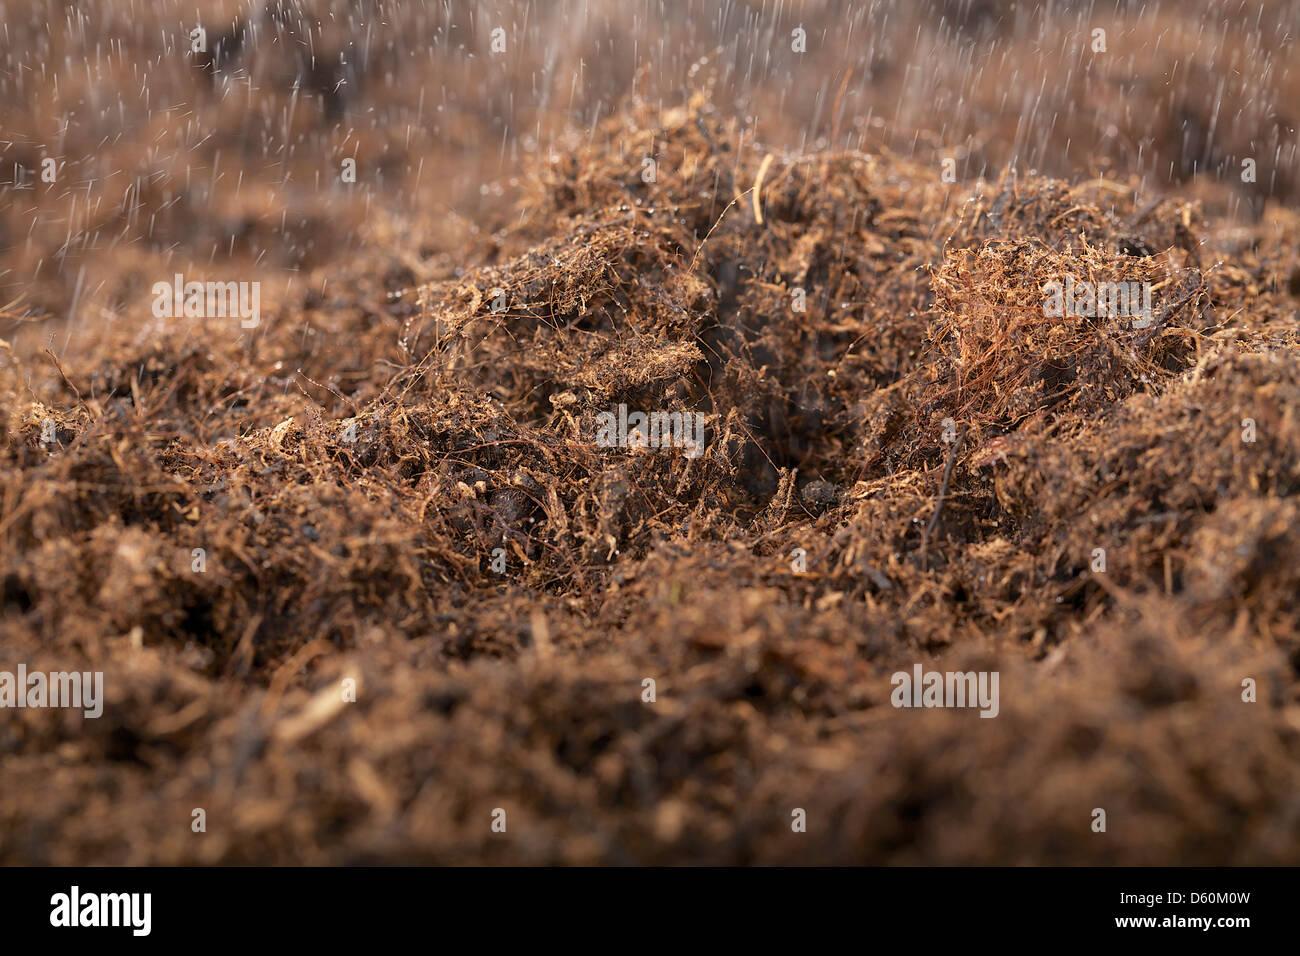 Garden Soil Rain Stock Photos Amp Garden Soil Rain Stock